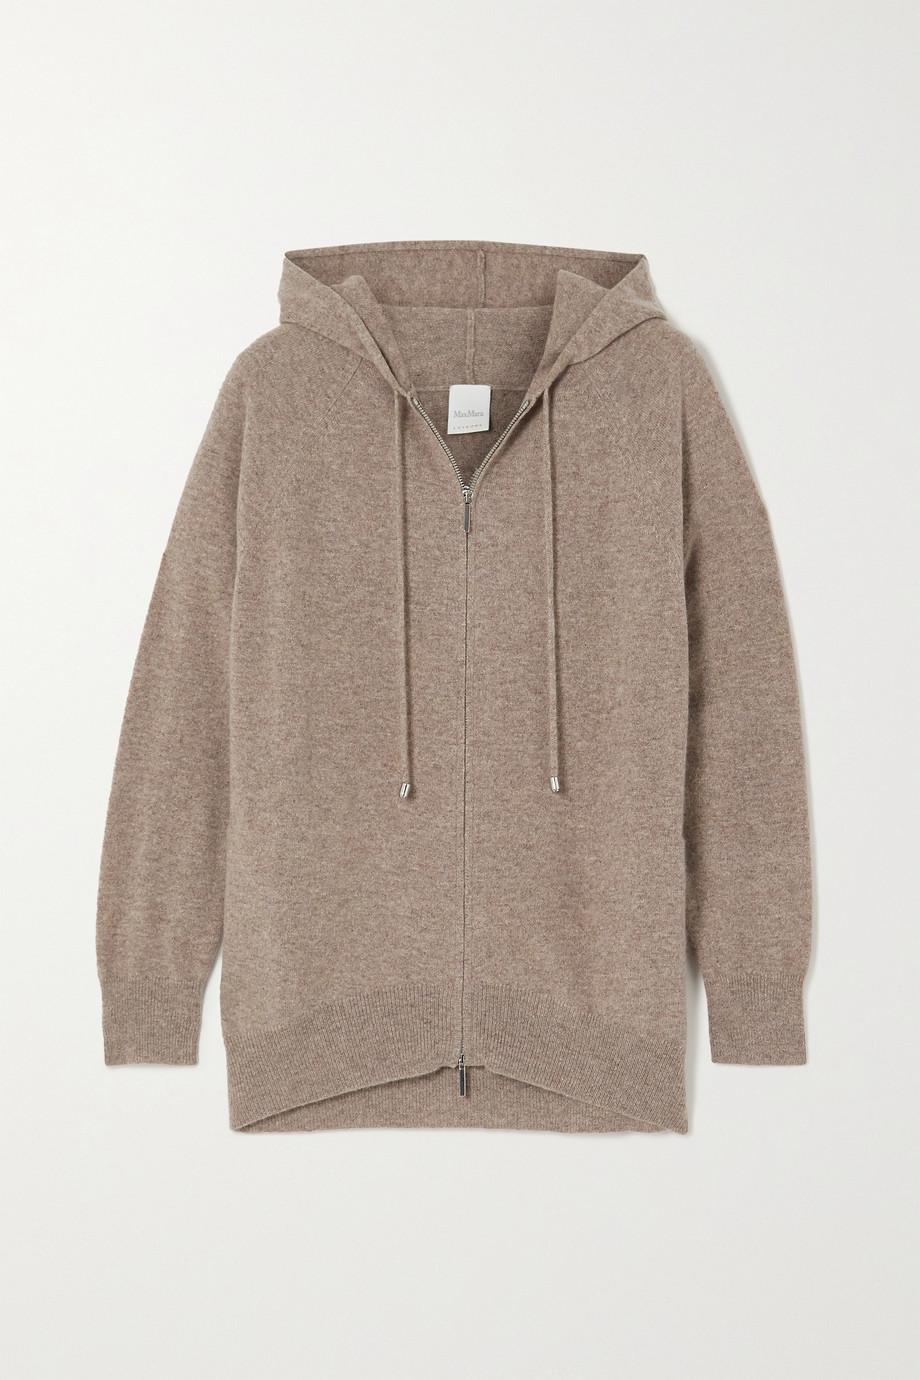 Max Mara Leisure mélange cashmere hoodie